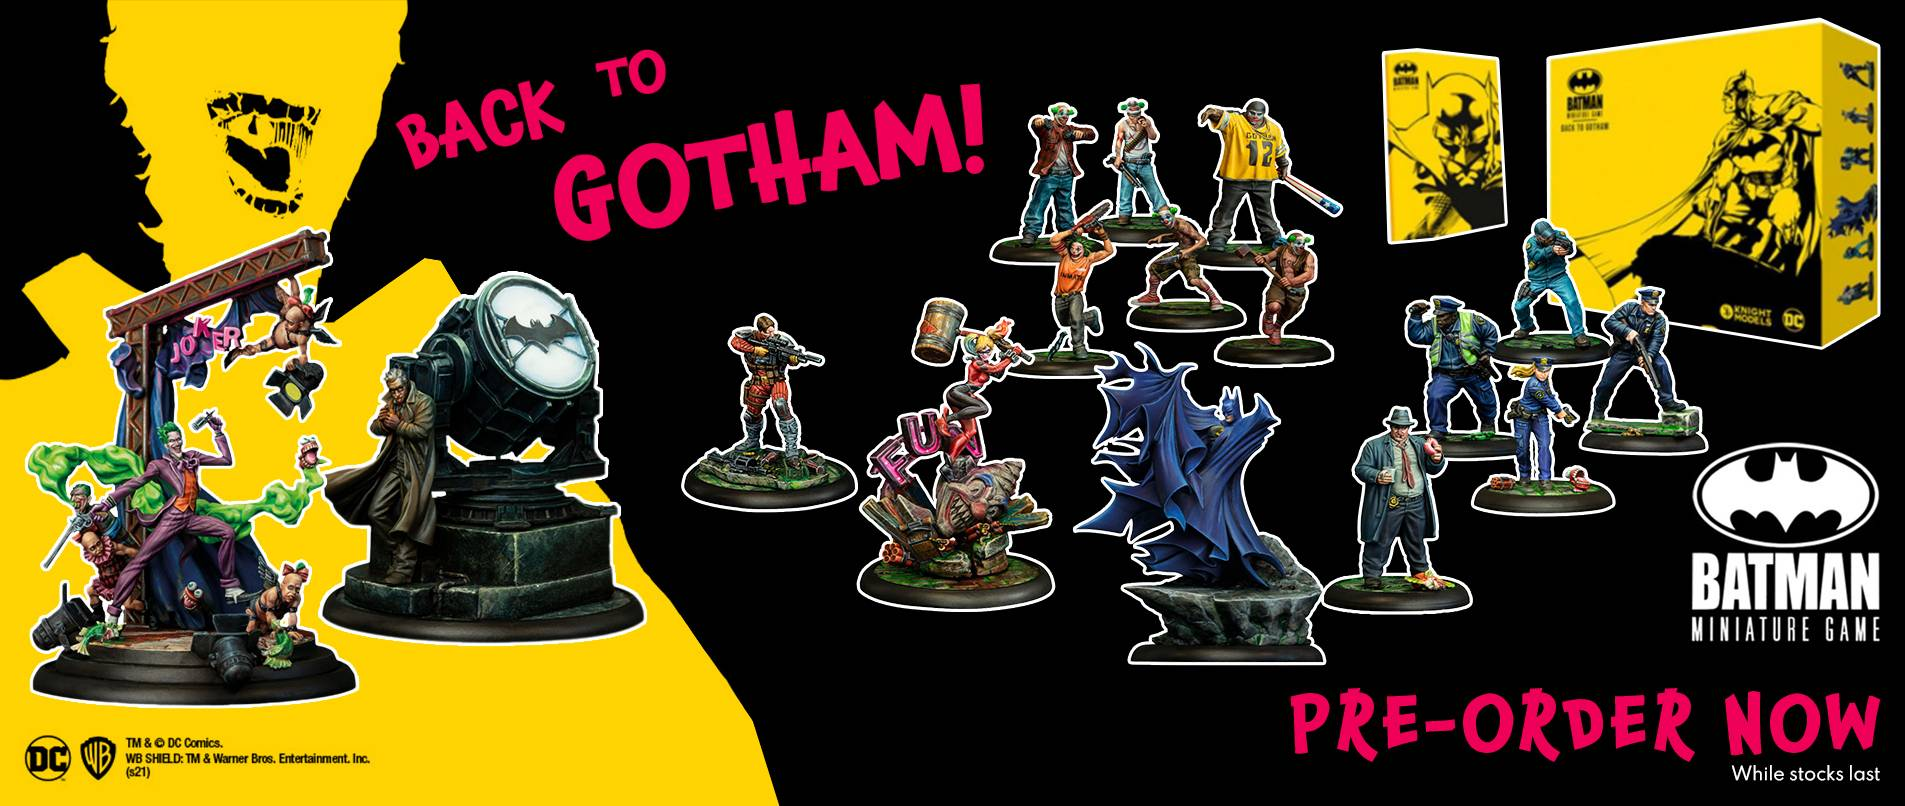 Batman - Knight Models - Warcradle Distribution